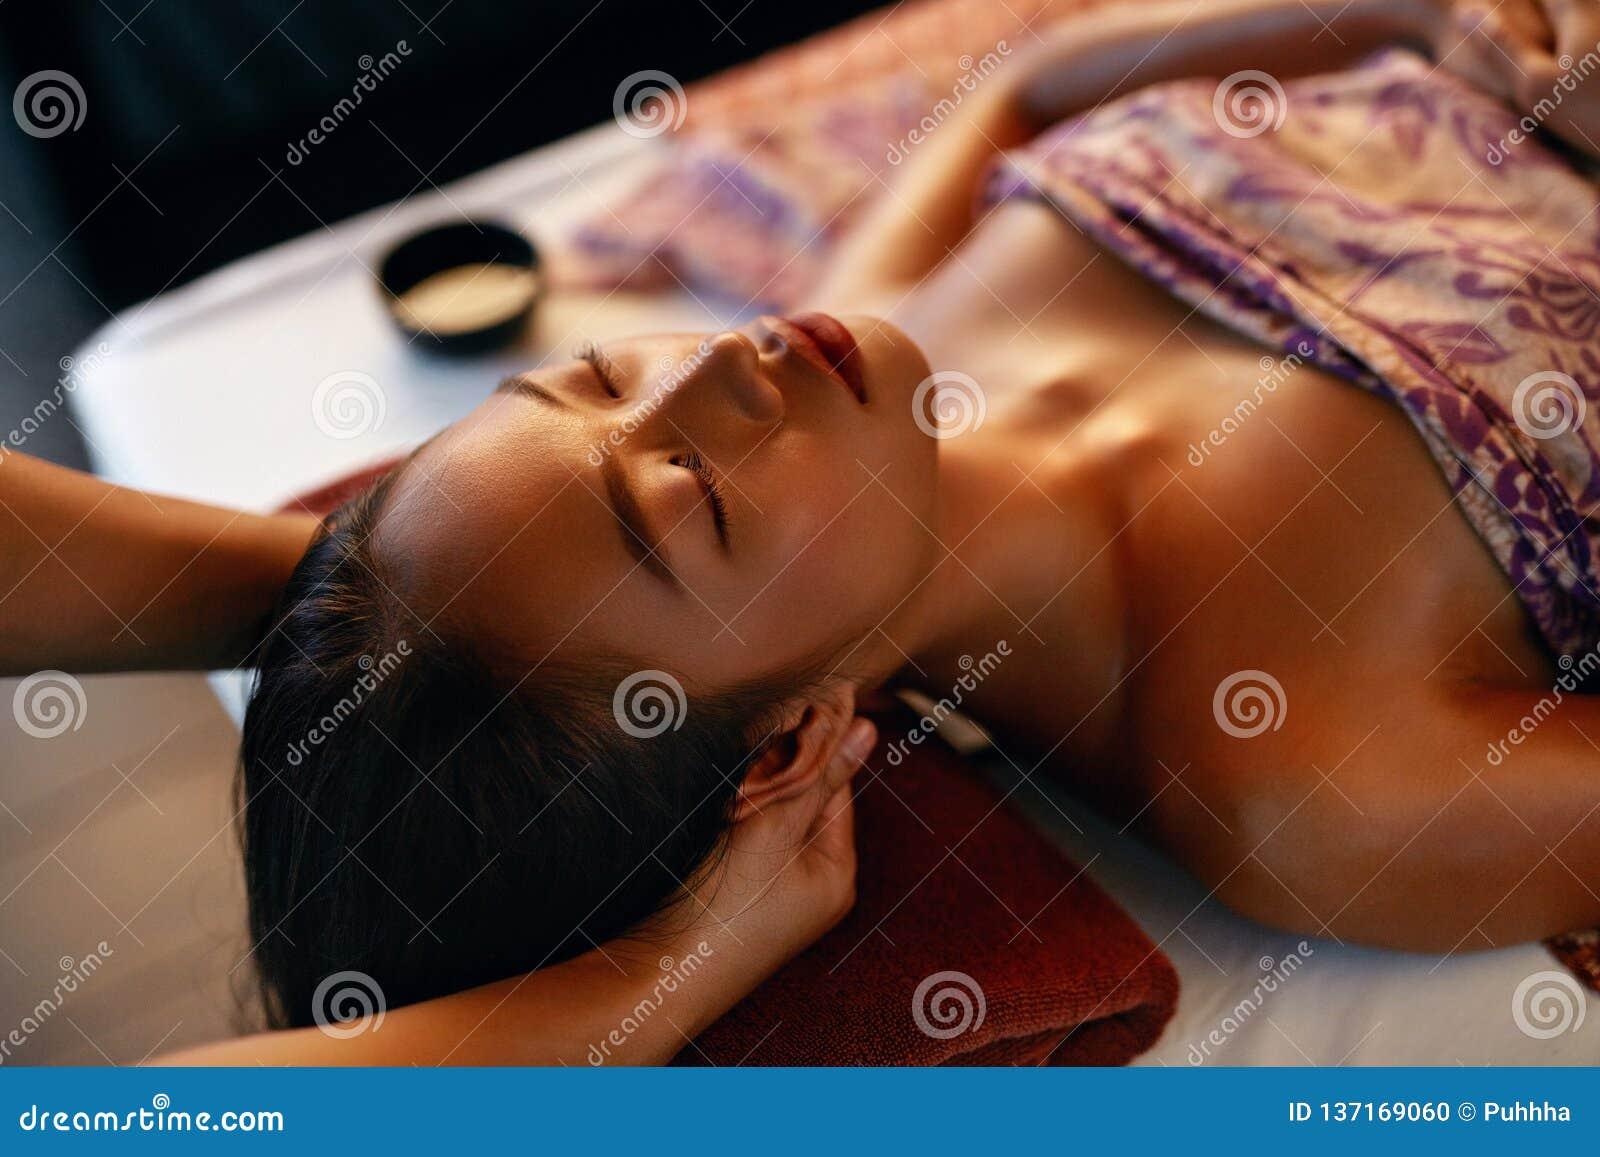 Spa Massage. Hands Massaging Woman Head At Thai Beauty Salon